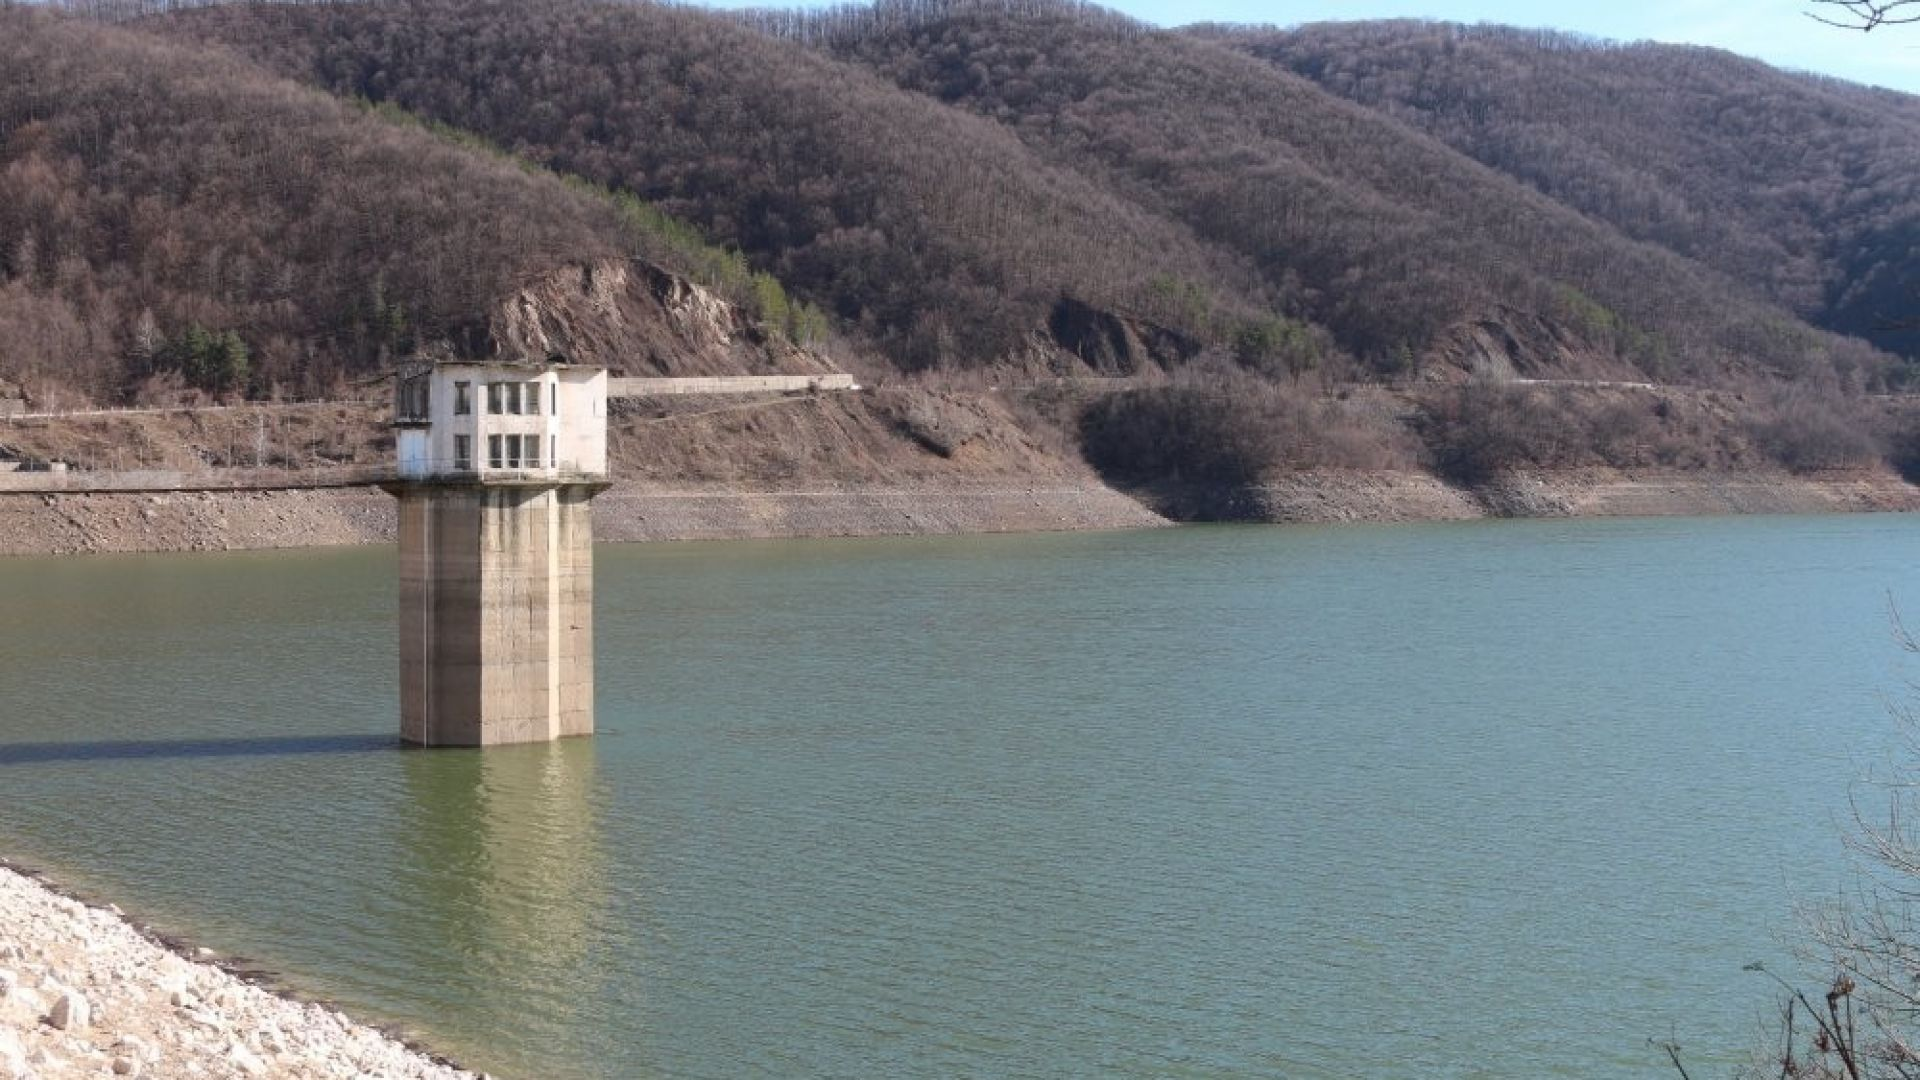 Спецпрокуратурата се самосезира за потенциална водна криза в Ботевград